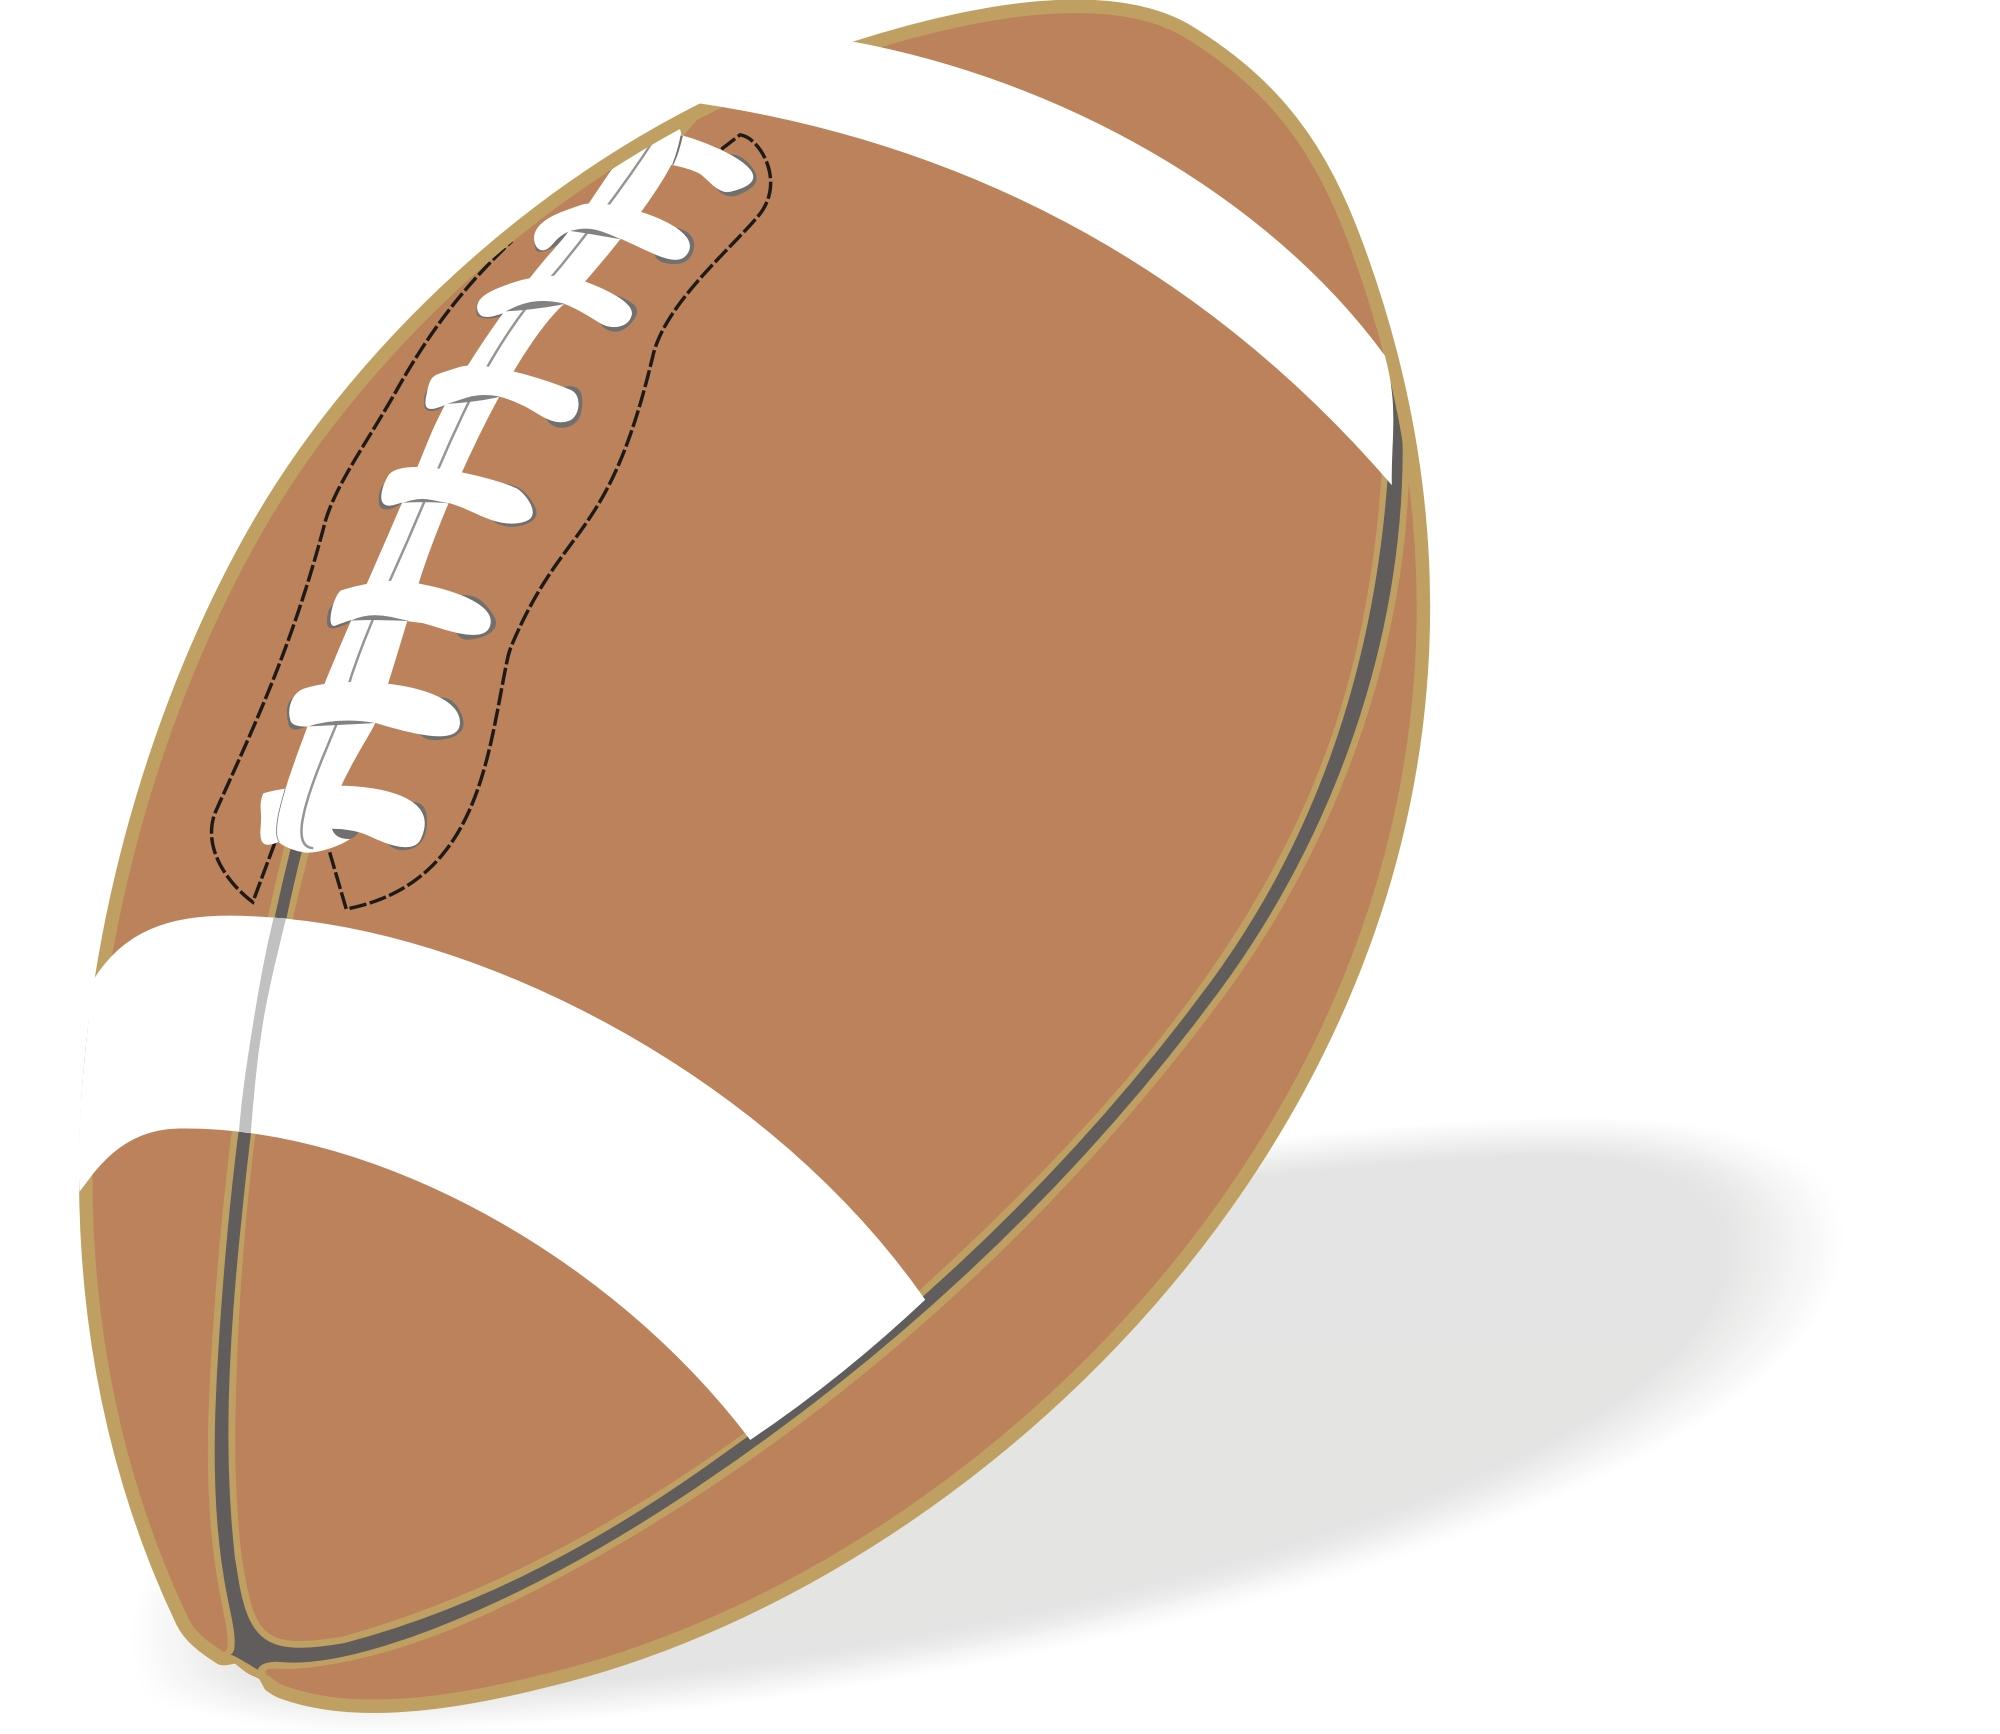 Clip Art Nfl Football Season .